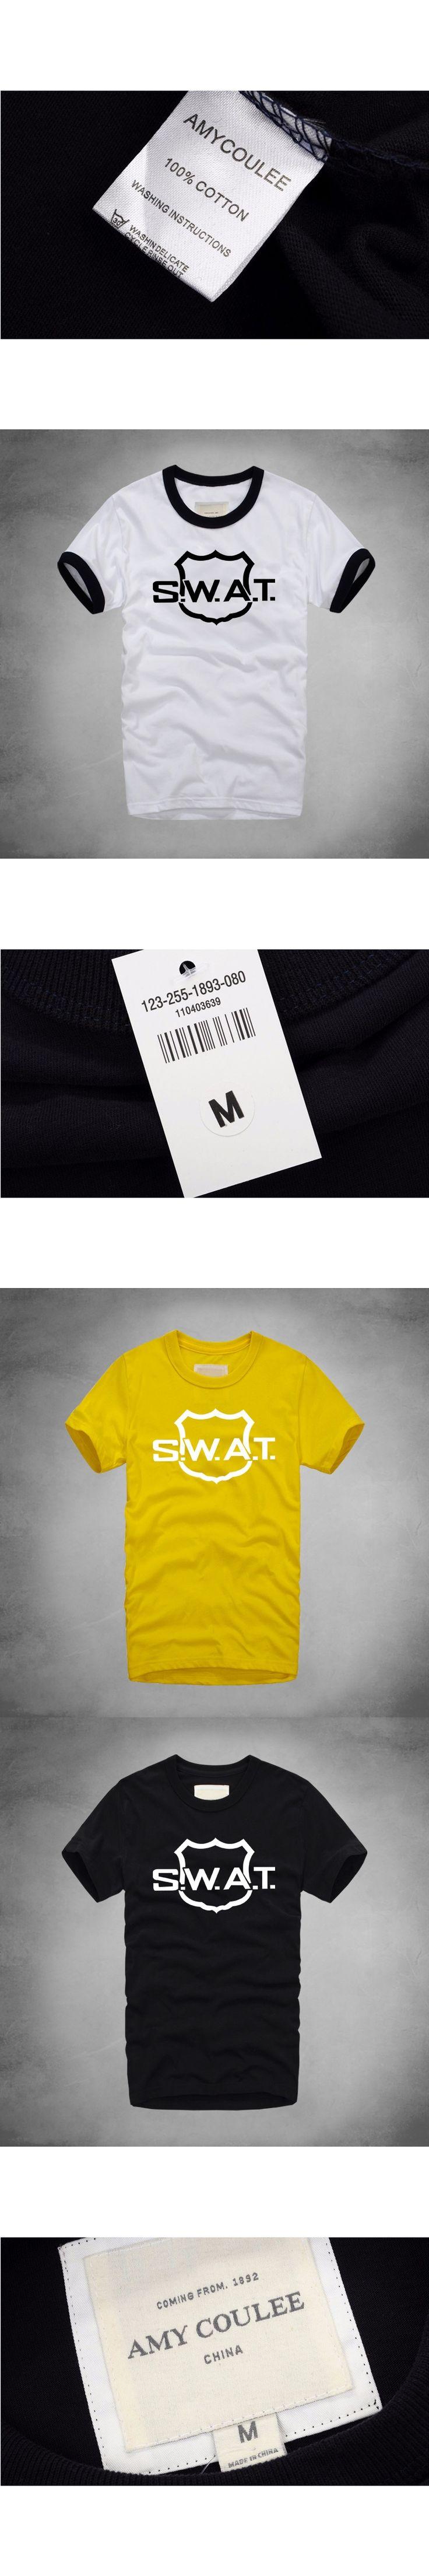 SWAT POLICE Print T shirt Men High Quality Palace Skateboards T-Shirts Summer Style 100% Cotton Short Sleeve Causal T shirt